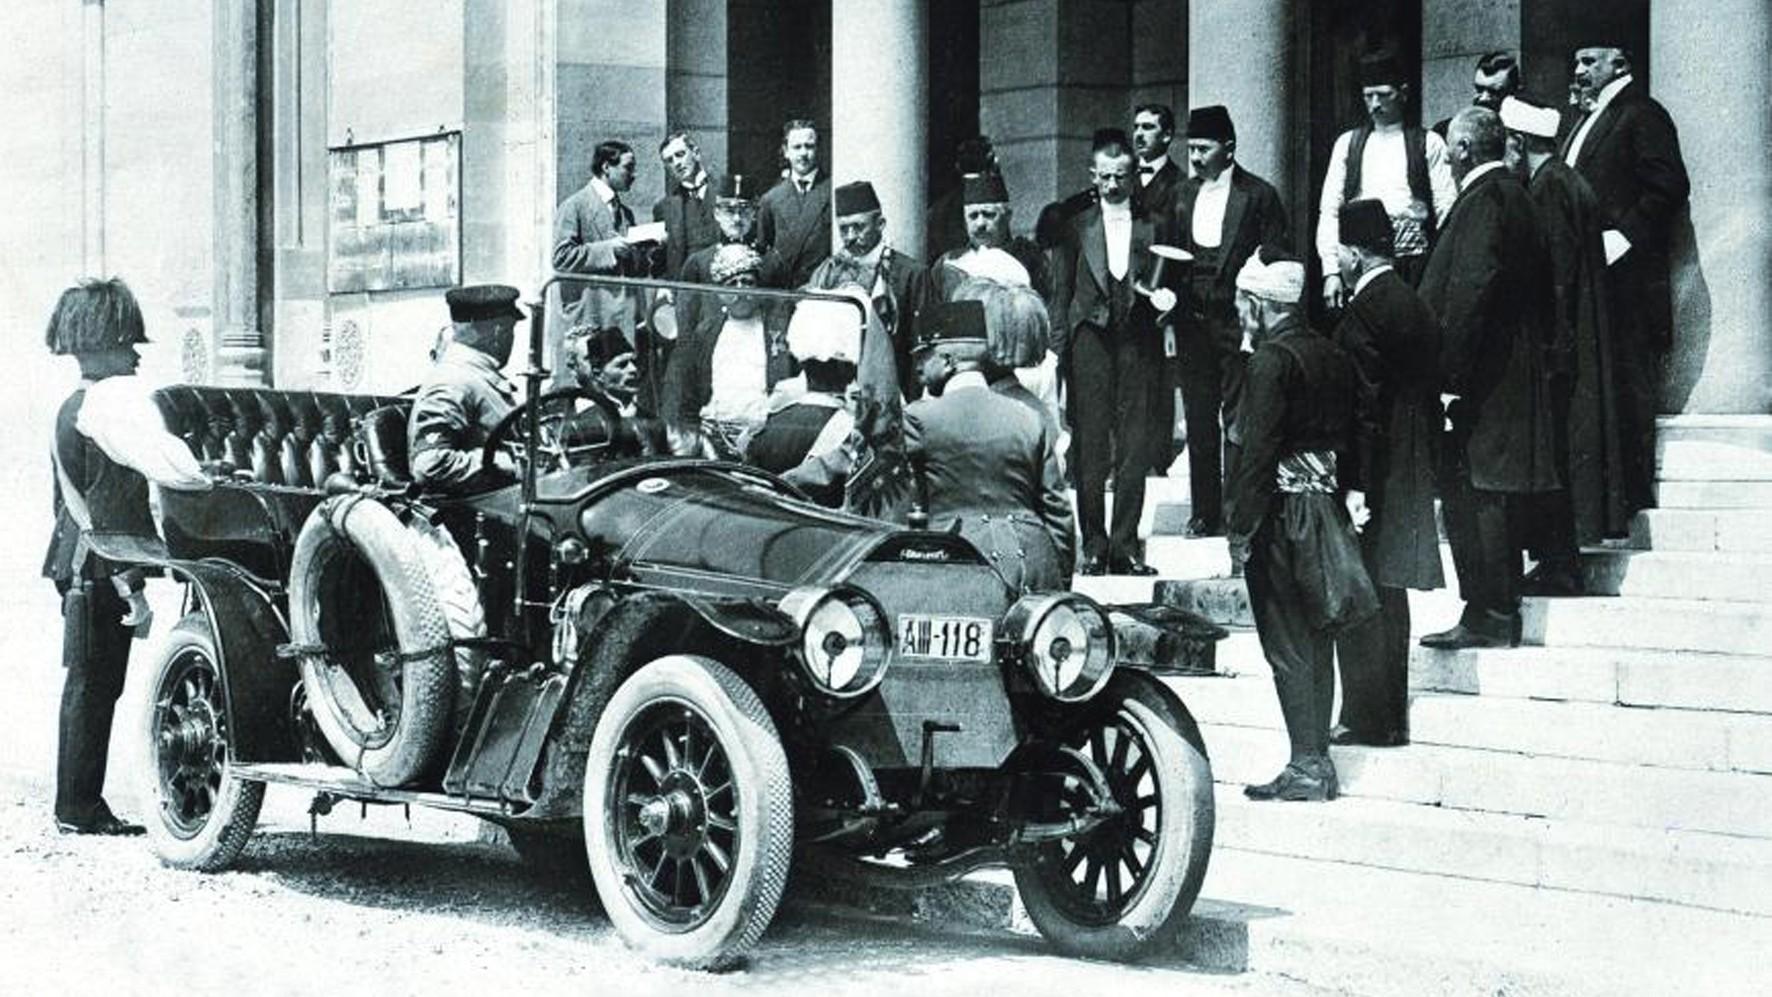 убийство наследника австро венгерского престола эрцгерцога франца